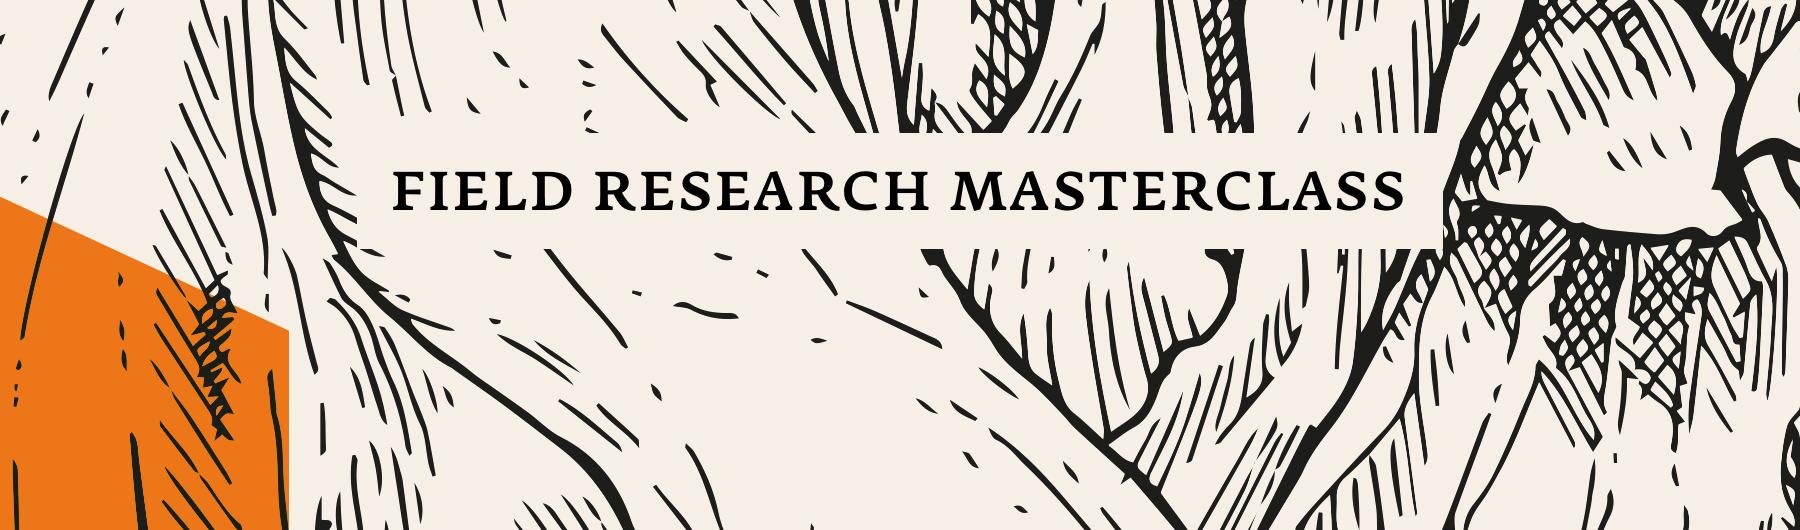 Jan Chipchase - Field Research Masterclass, Sydney, December 1st